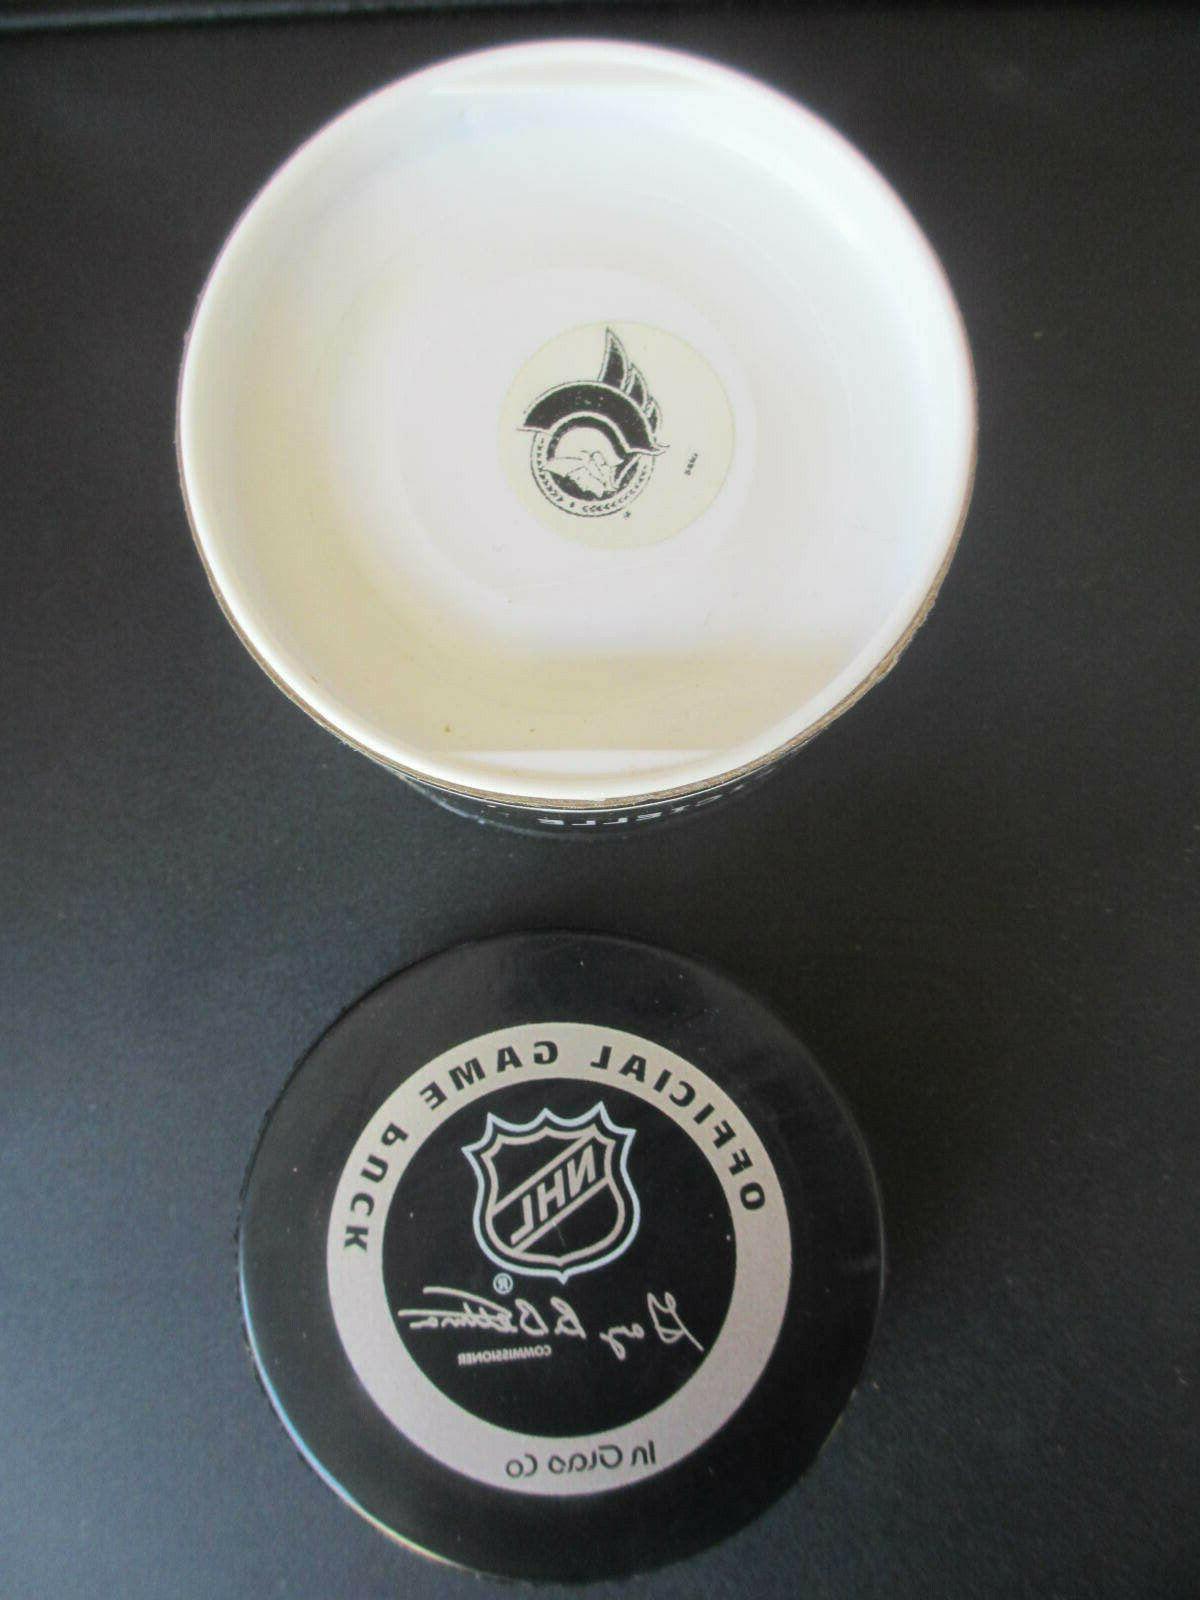 Ottawa Senators Official NHL Game Hockey Puck in Original Package